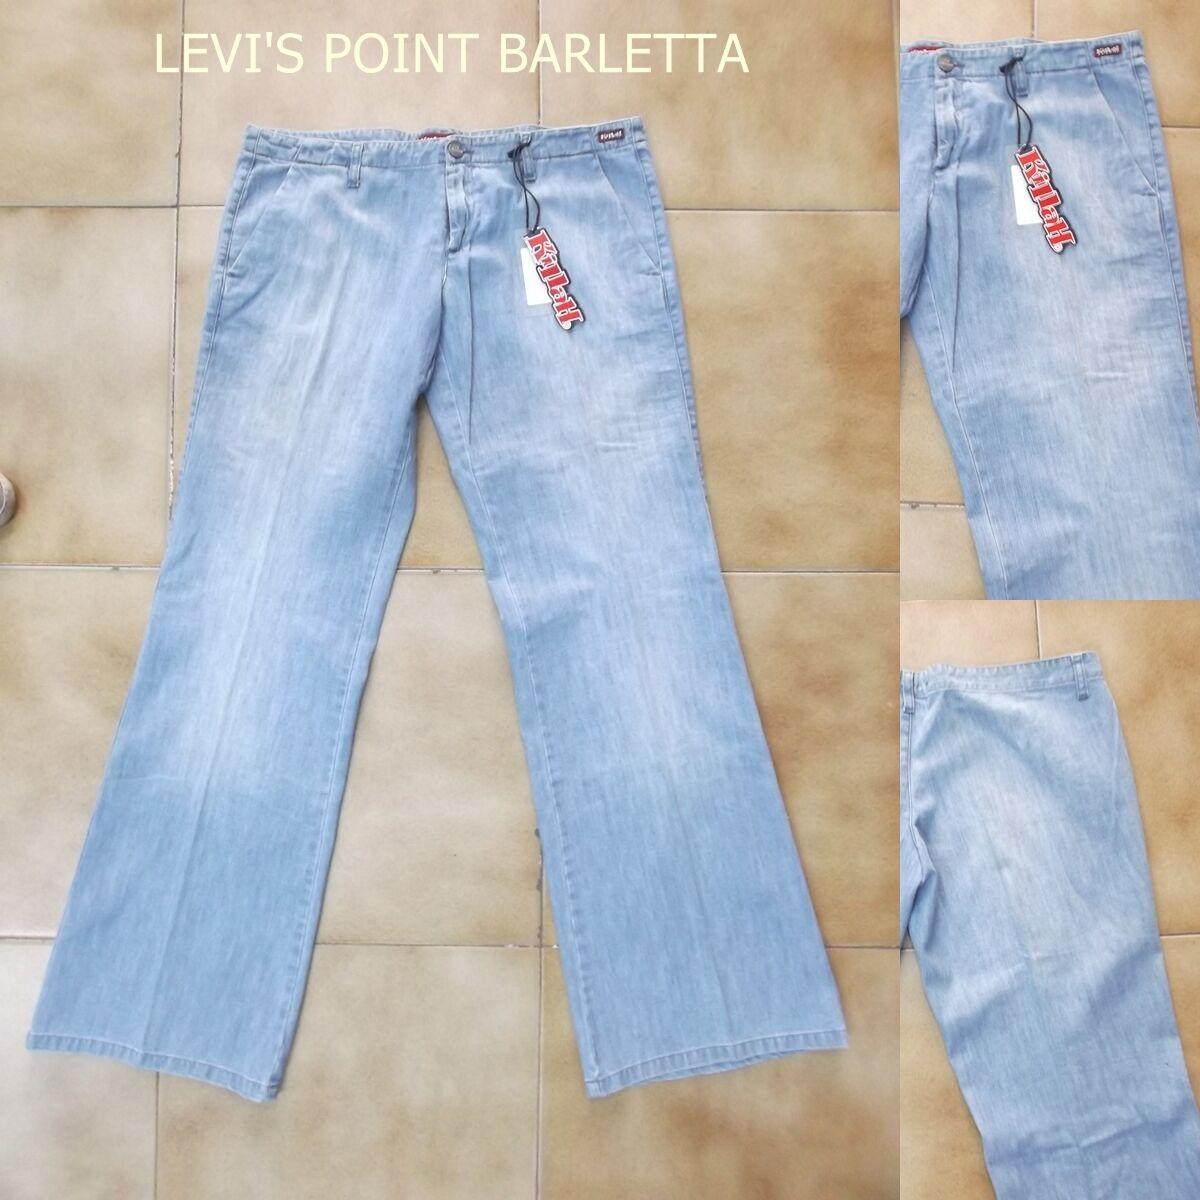 Jeans Jeans Jeans Killah A Palazzo Donna A Zampa D'elefante Vita Bassa Celeste Tg W 31 W 33 59d2d0